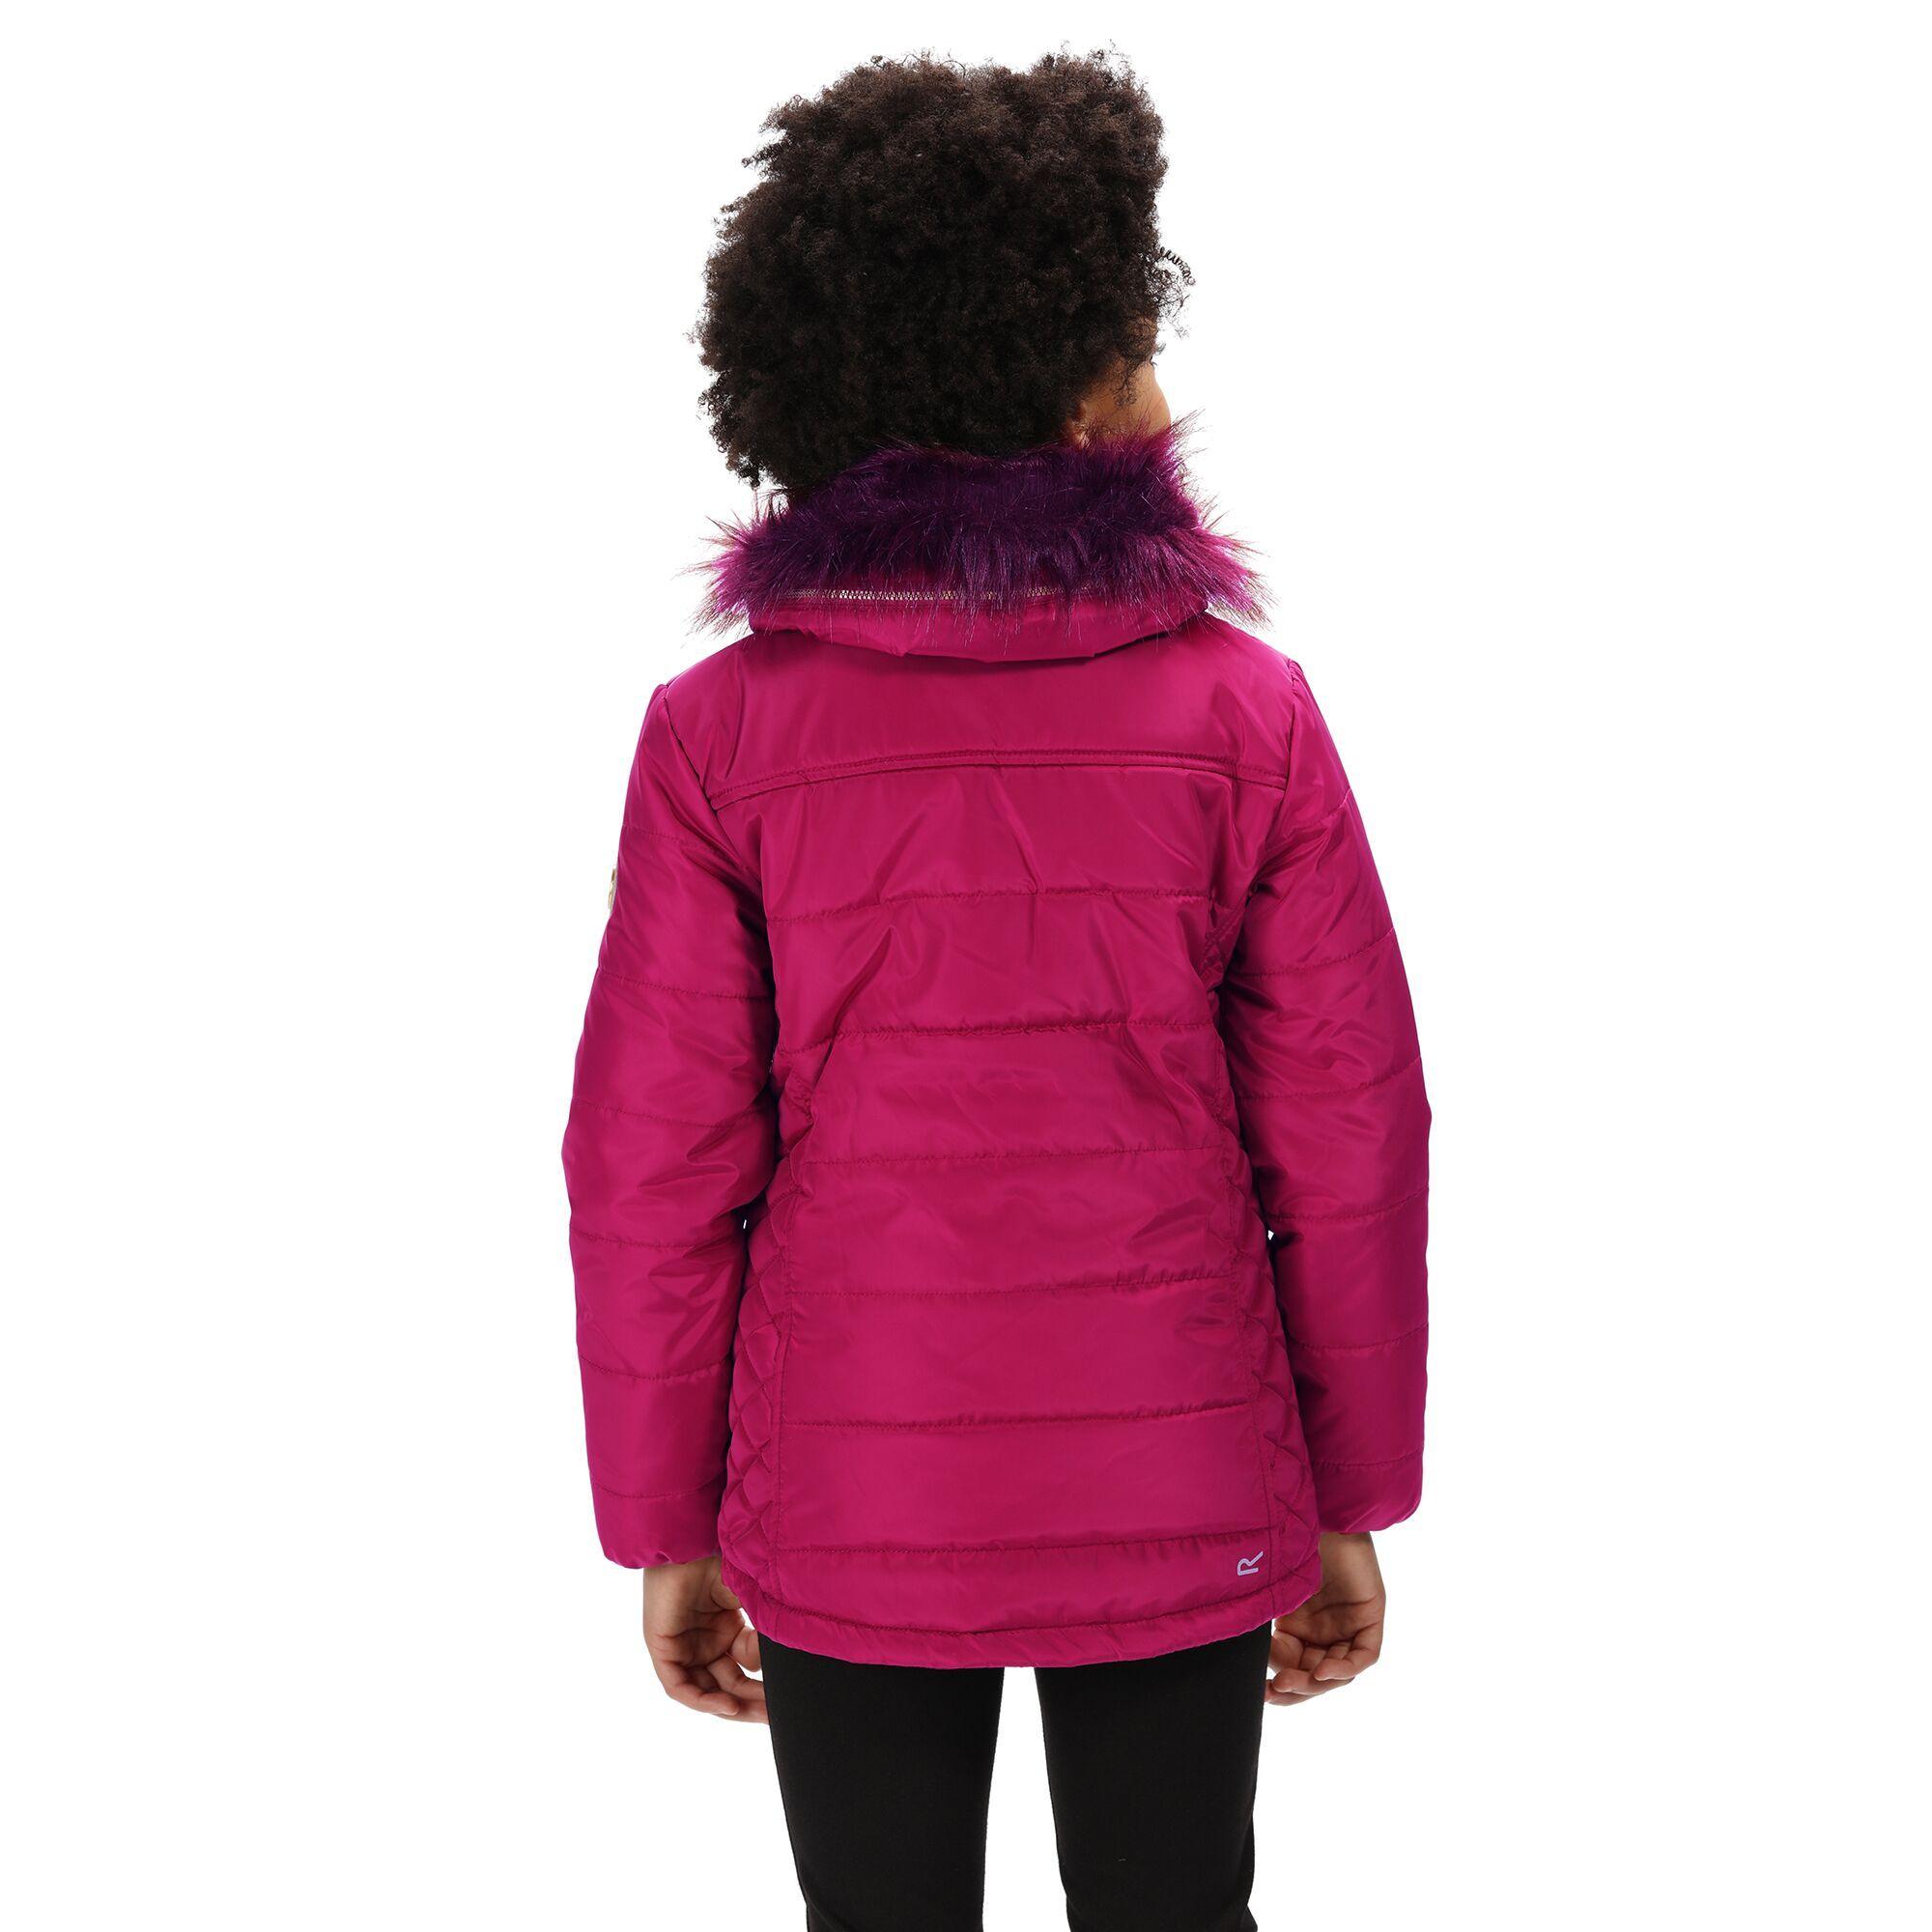 Regatta Childrens/Kids Westhill Faux Fur Trim Hooded Jacket